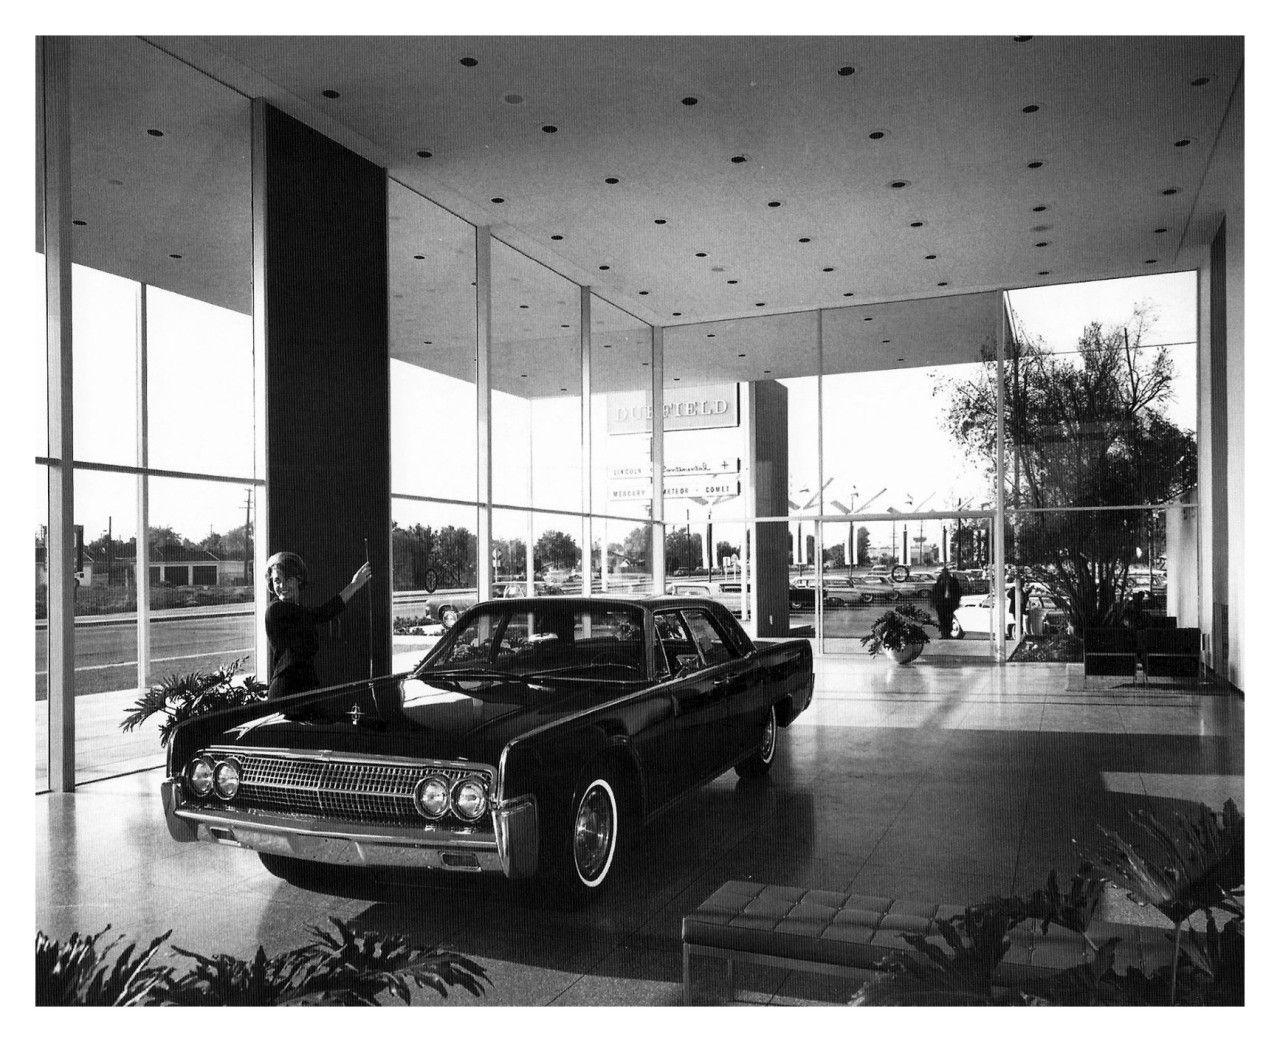 1963 Duffield Lincoln Mercury Dealership Showroom Long Beach